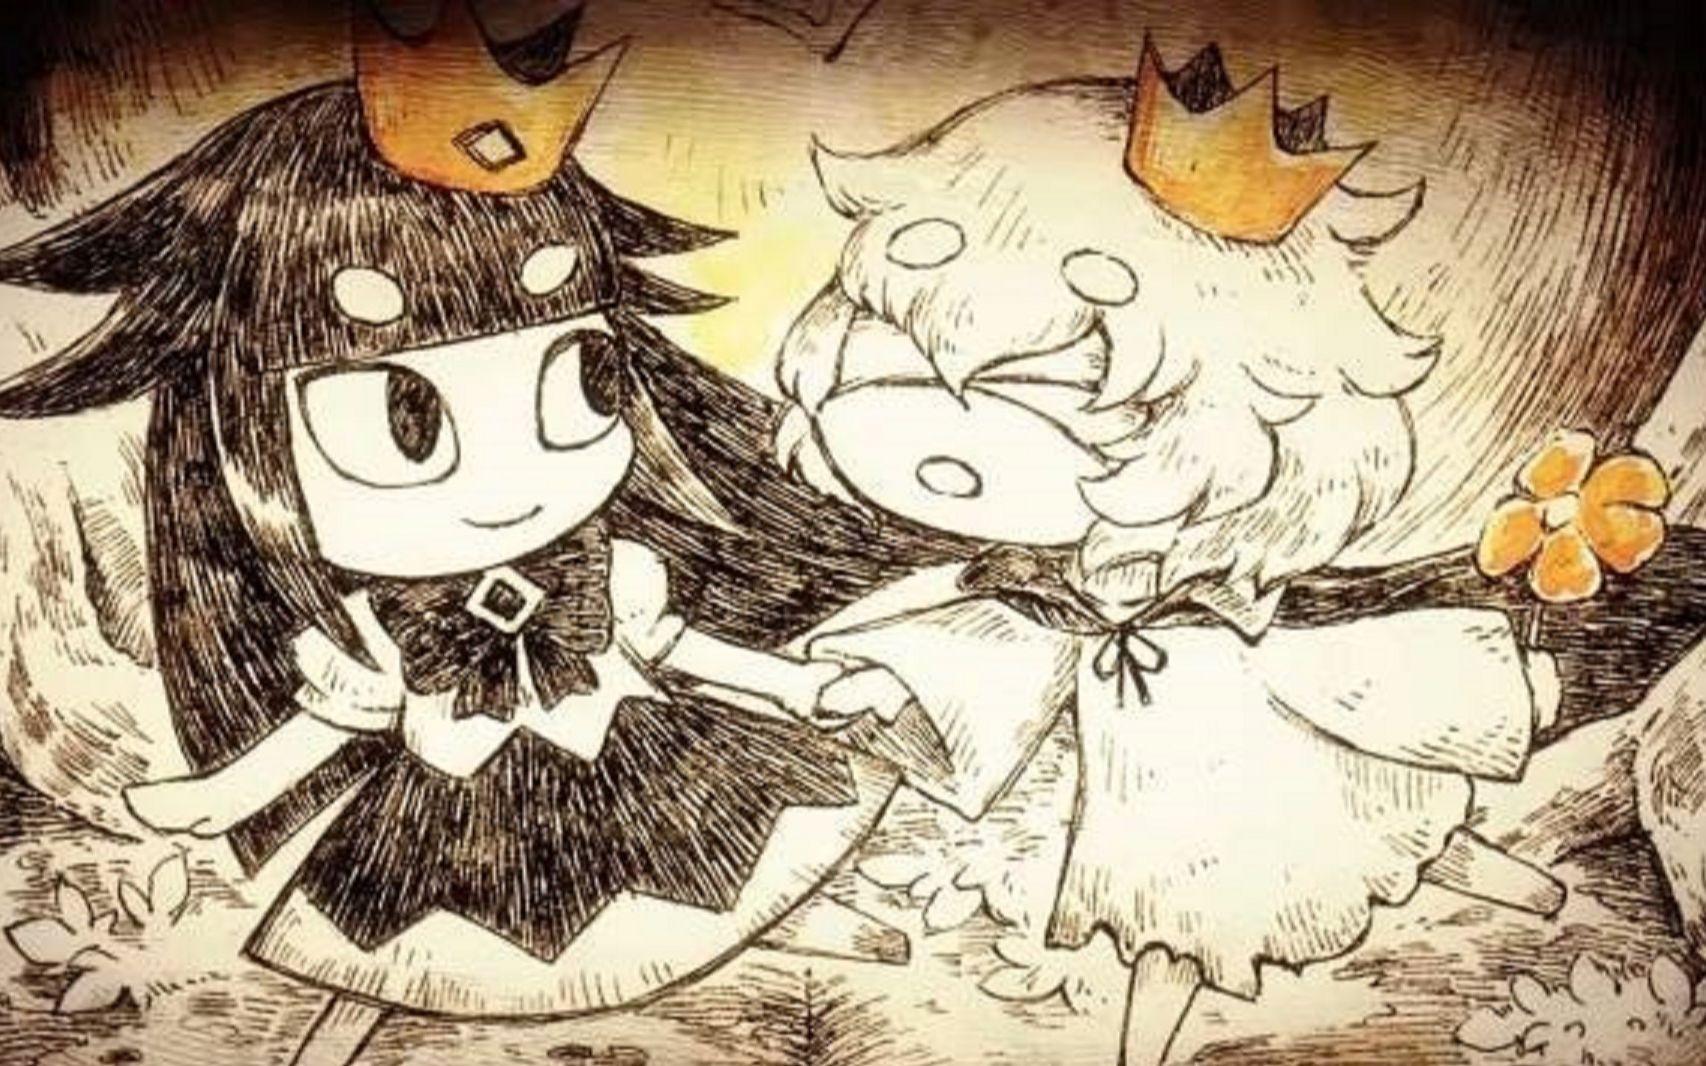 YAYA剧场【说谎公主和失明王子】一个十分凄美但又感人的爱情故事!